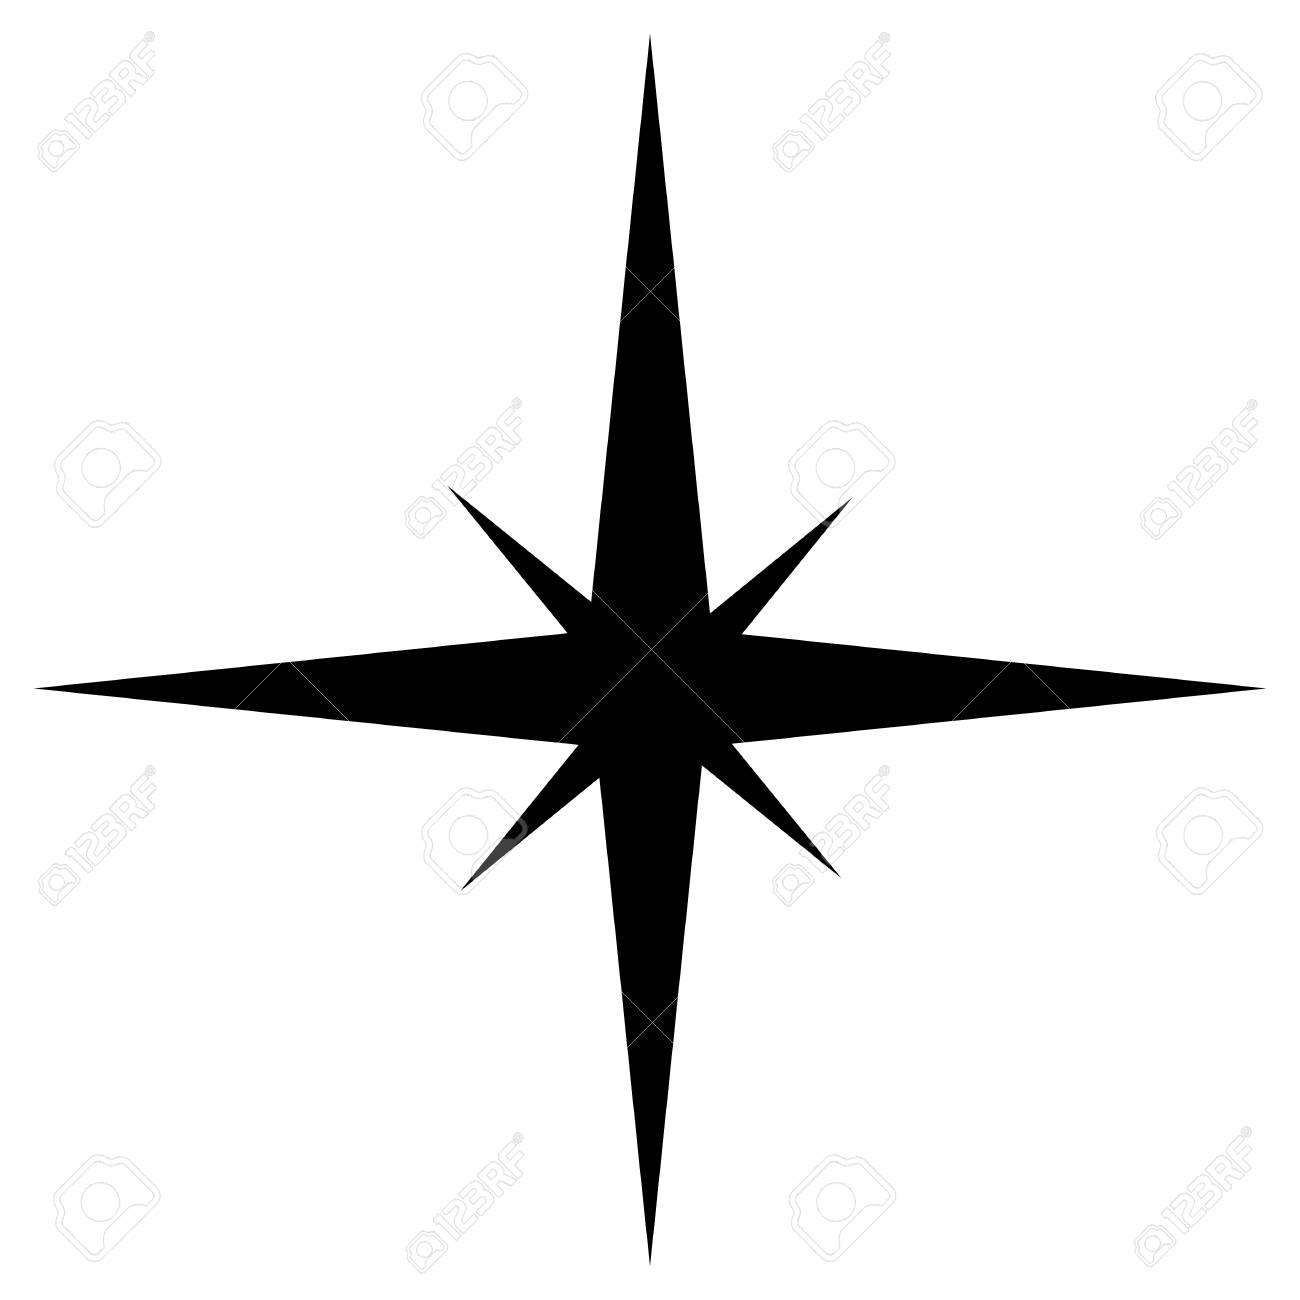 cf7962121465 sparkle icon on white background. flat style. sparkle symbol. black sparkle  symbol.